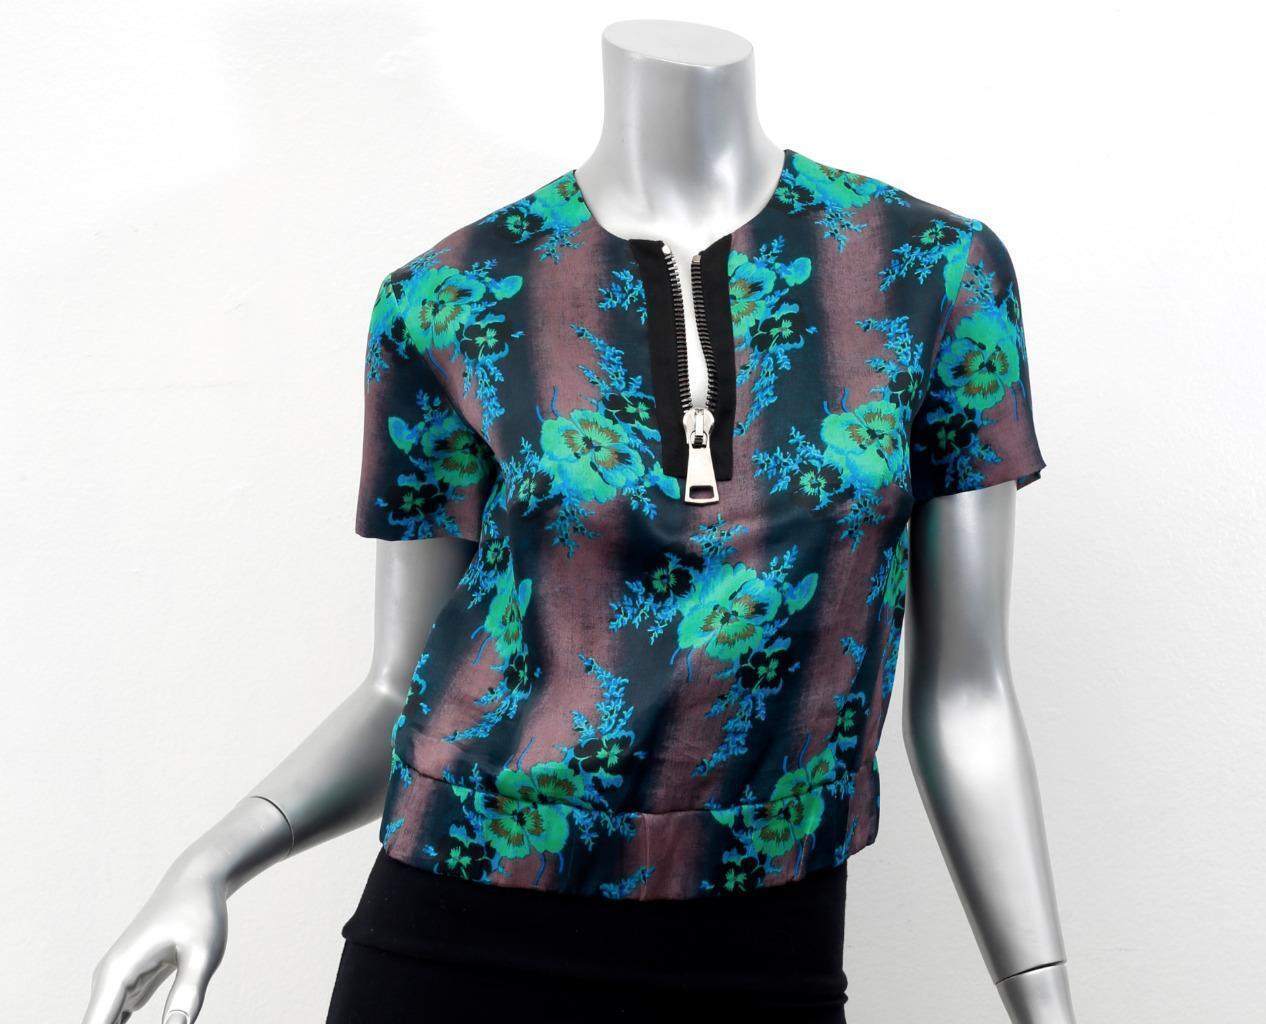 CHRISTOPHER KANE Grün schwarz Floral Silk OverGrößed Zipper Blouse Top US 6 NEW